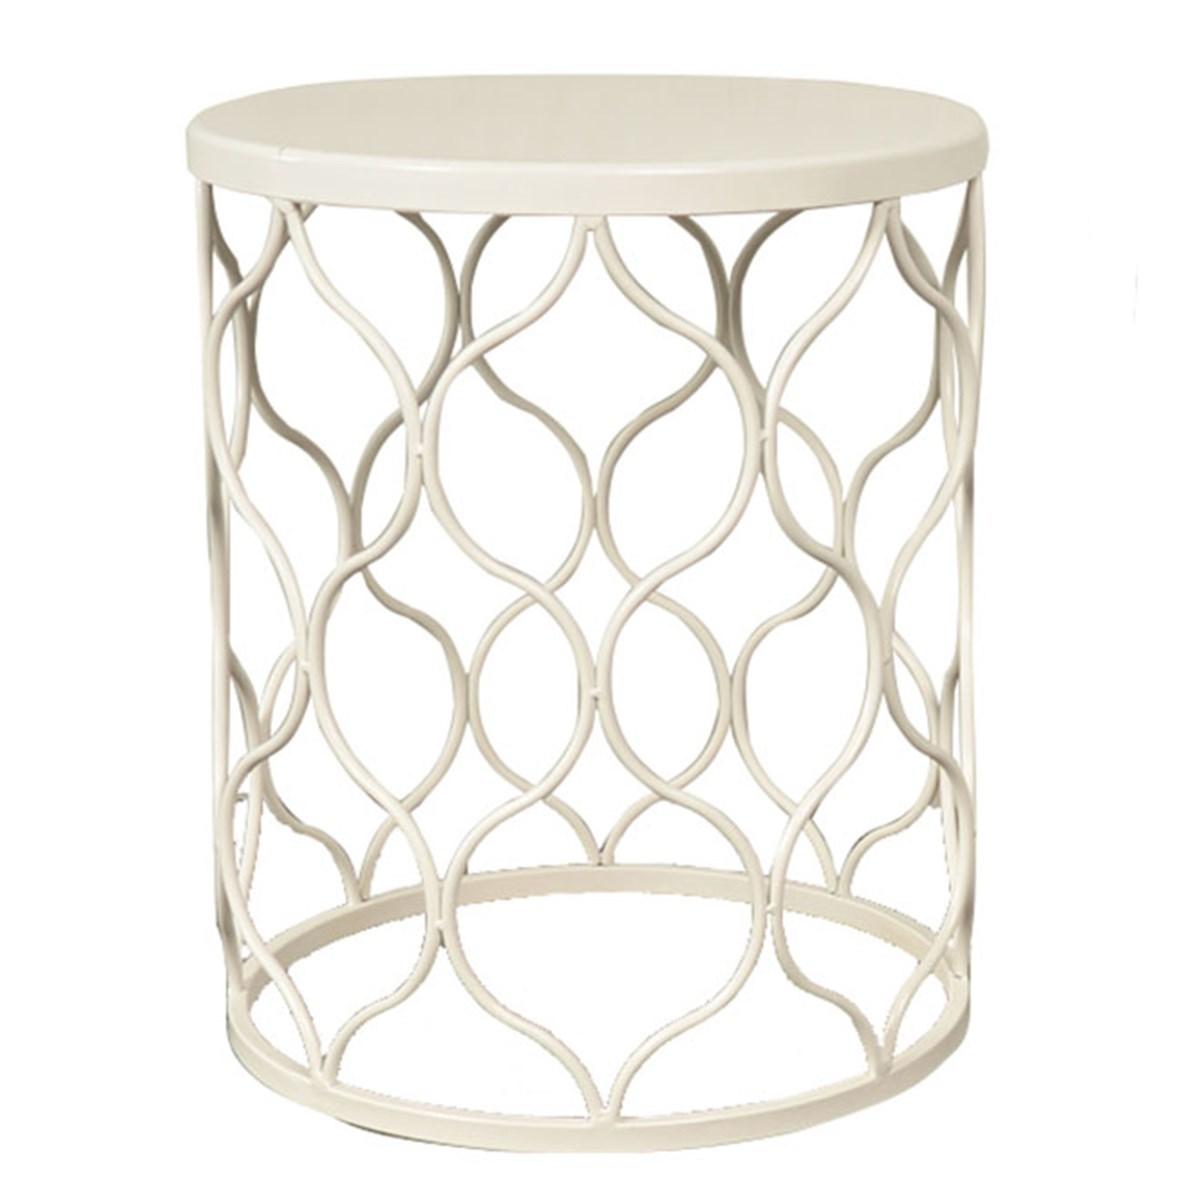 Sensational J Hunt Small White Metal Garden Stool 13X16 5 Save 30 Evergreenethics Interior Chair Design Evergreenethicsorg